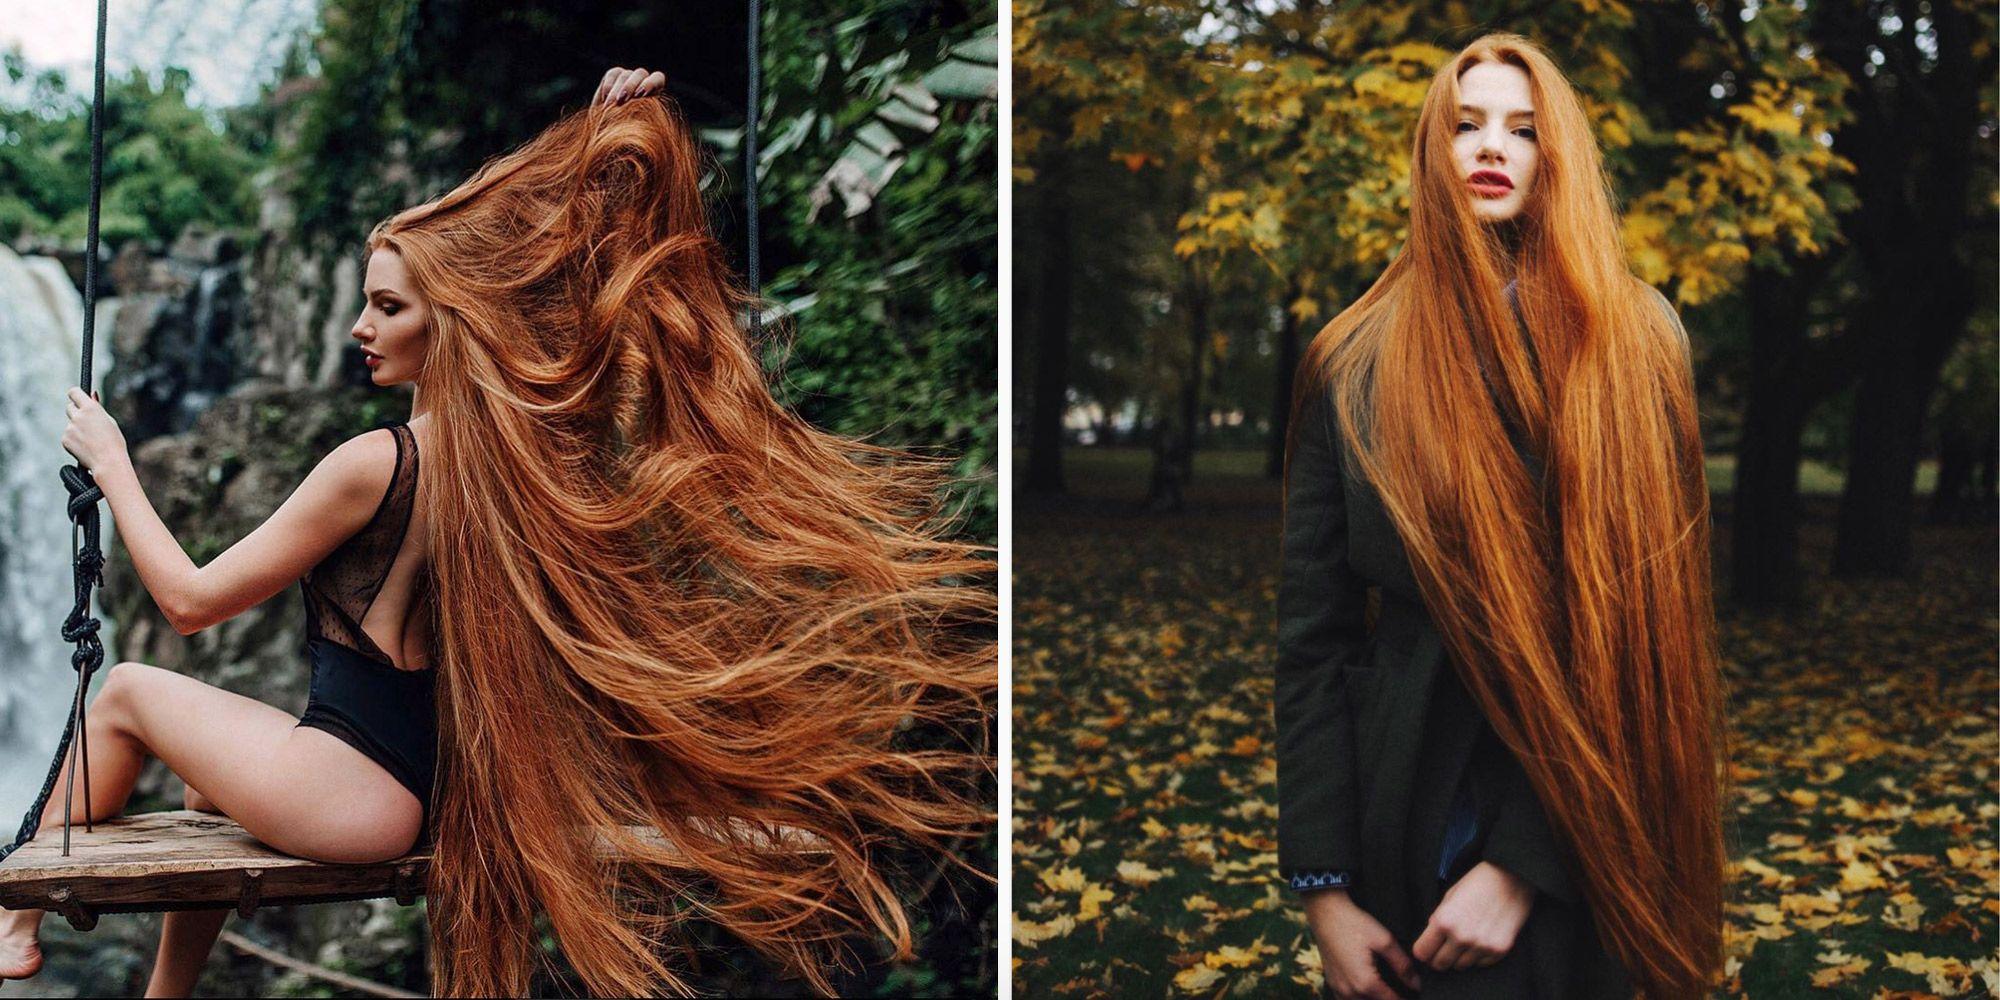 anastasiya sidorova is real life rapunzel with super long hair how